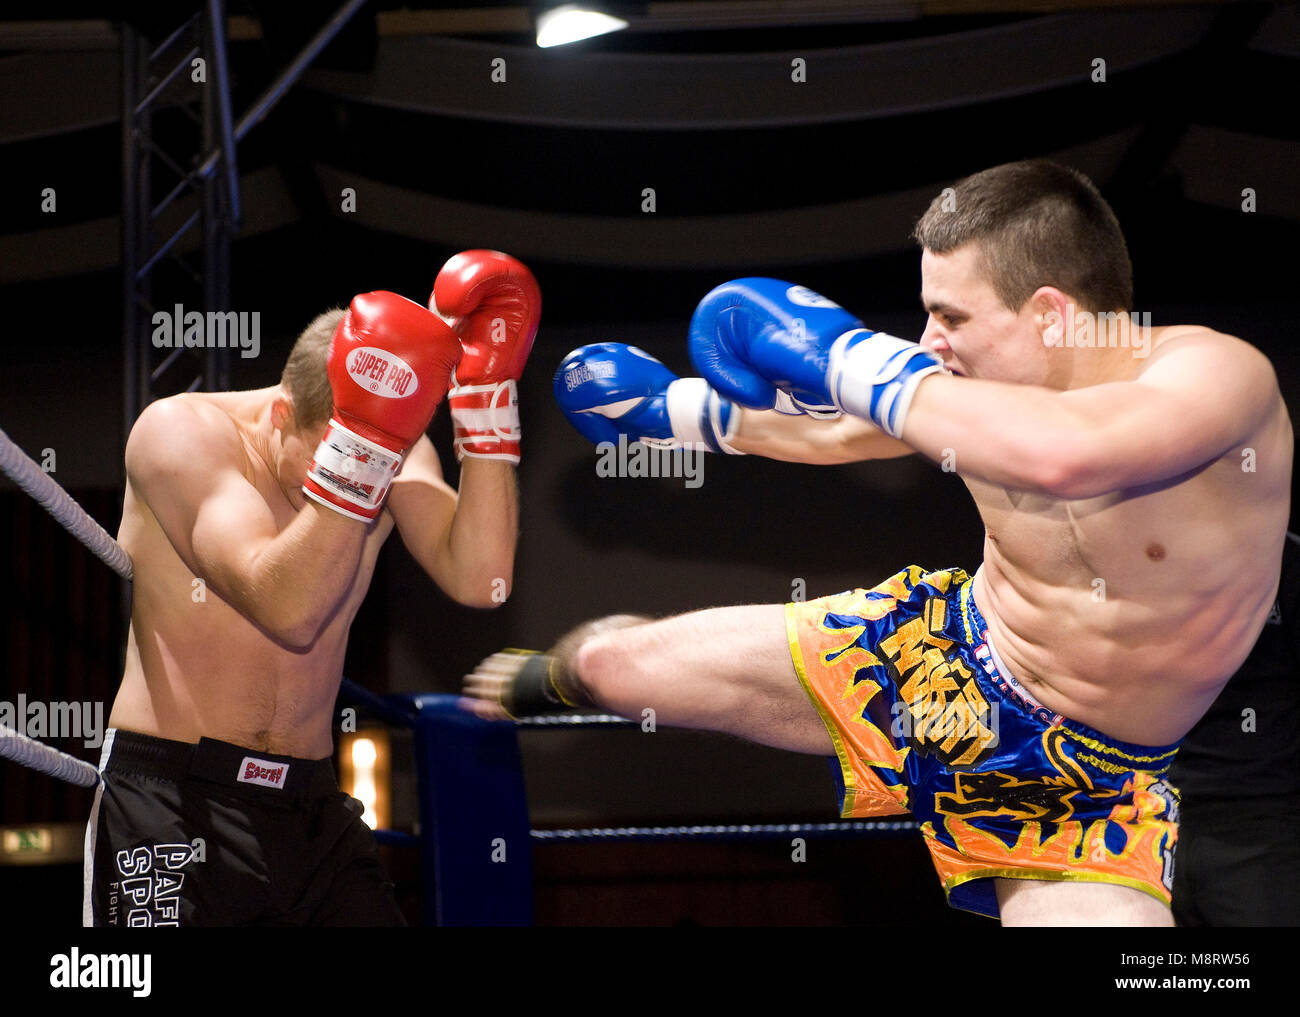 Kickboxen Kampf - Stock Image